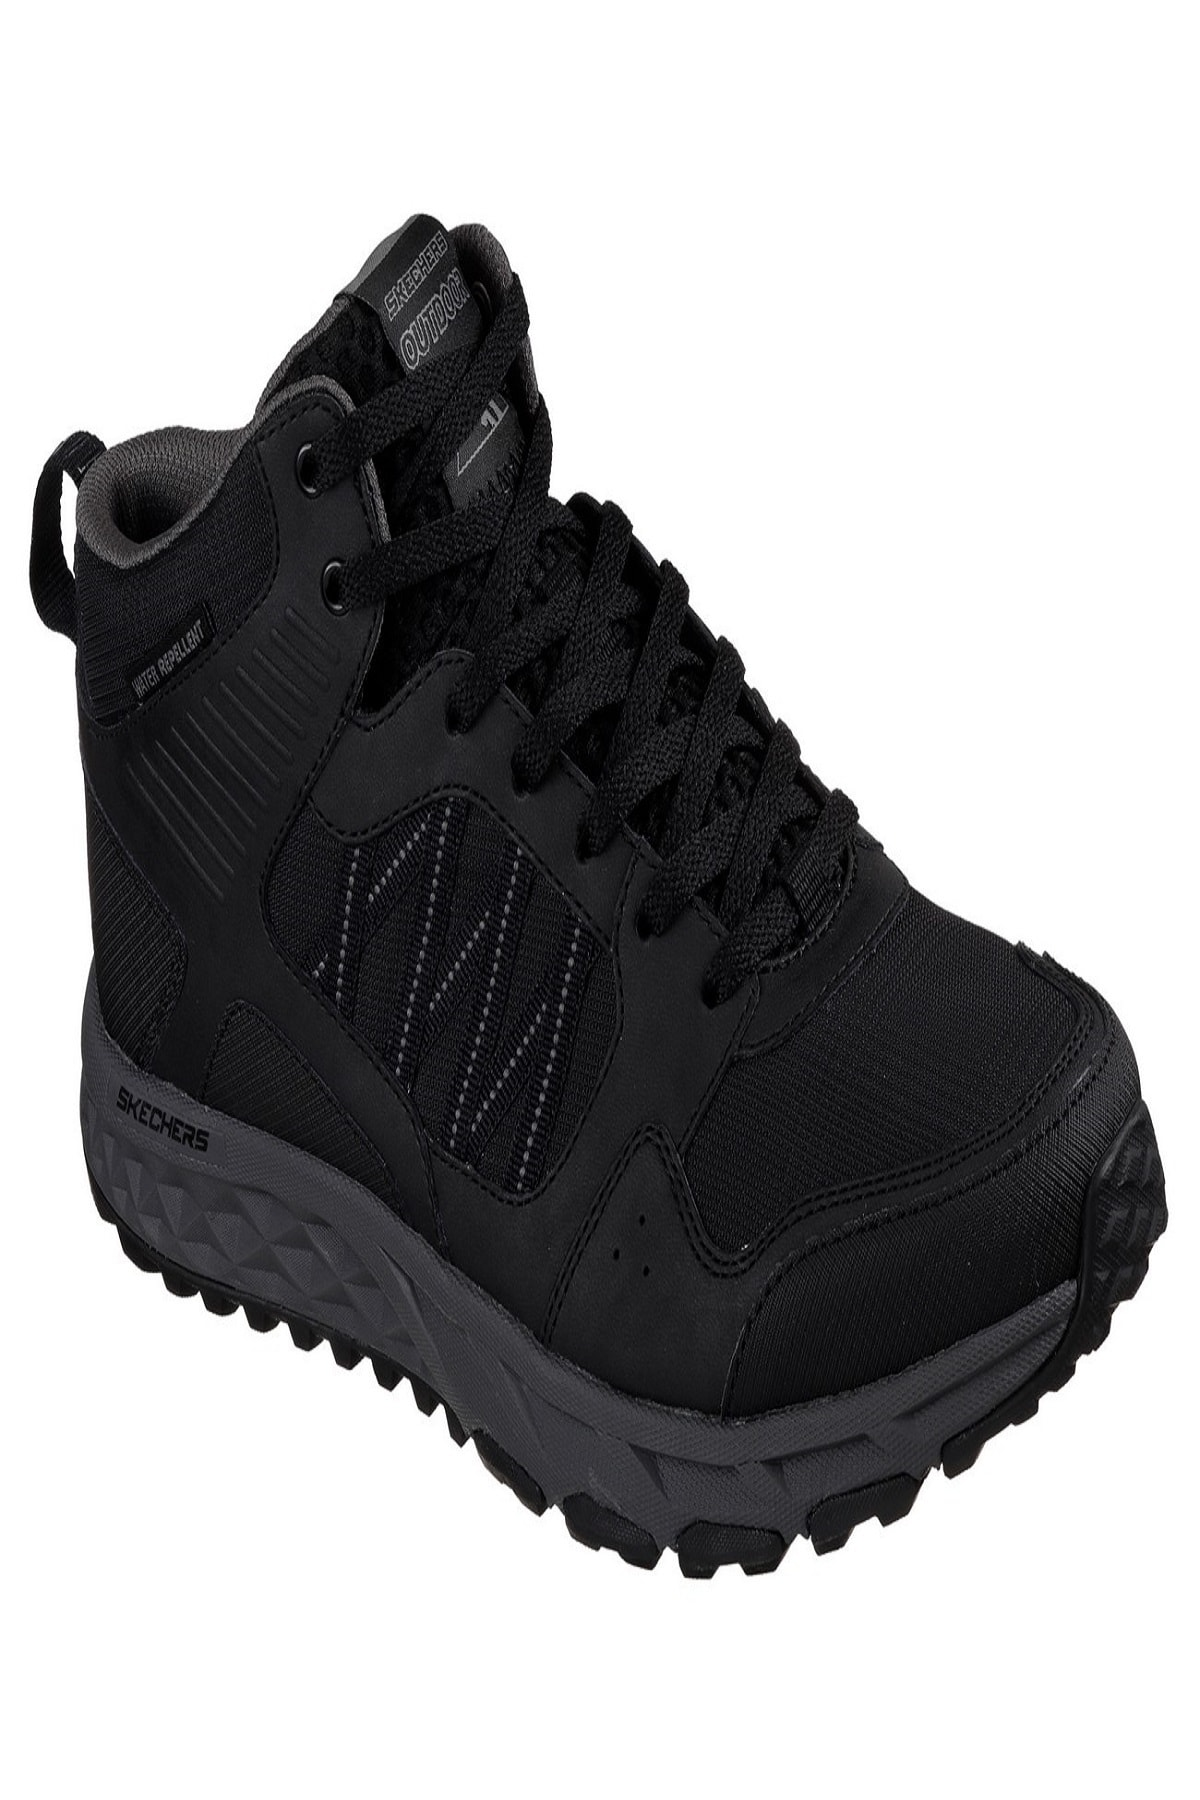 ESCAPE PLAN- SECOND BITE Erkek Siyah Outdoor Ayakkabı